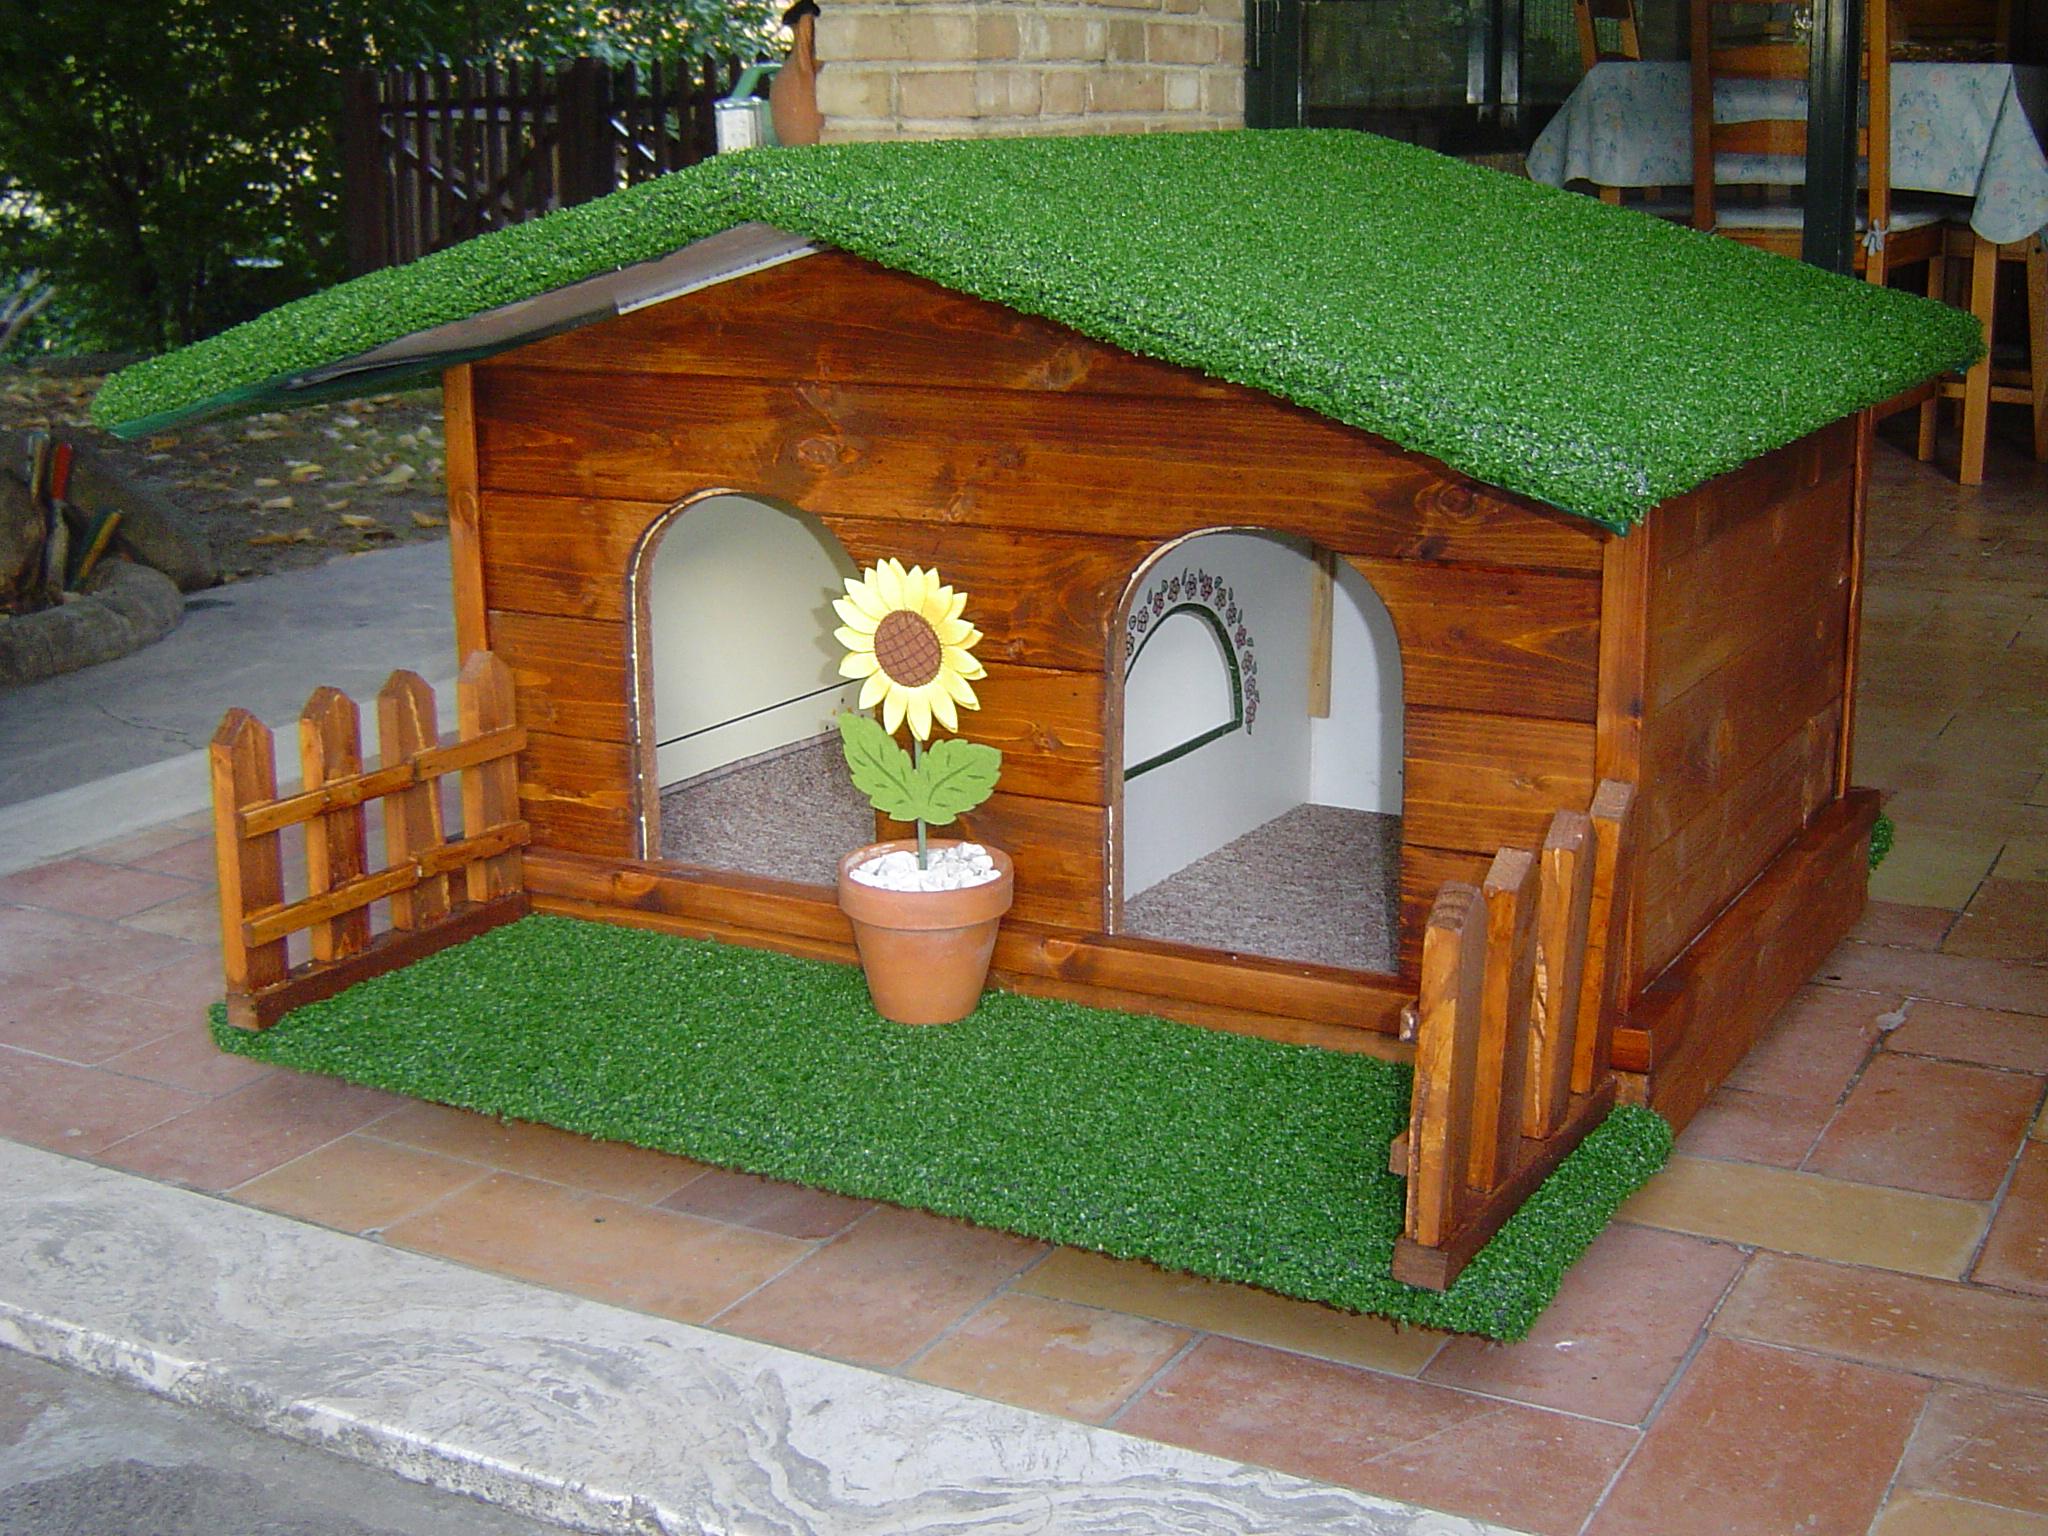 Cuccia Cane Grande Ikea cuccia cani - tutte le offerte : cascare a fagiolo